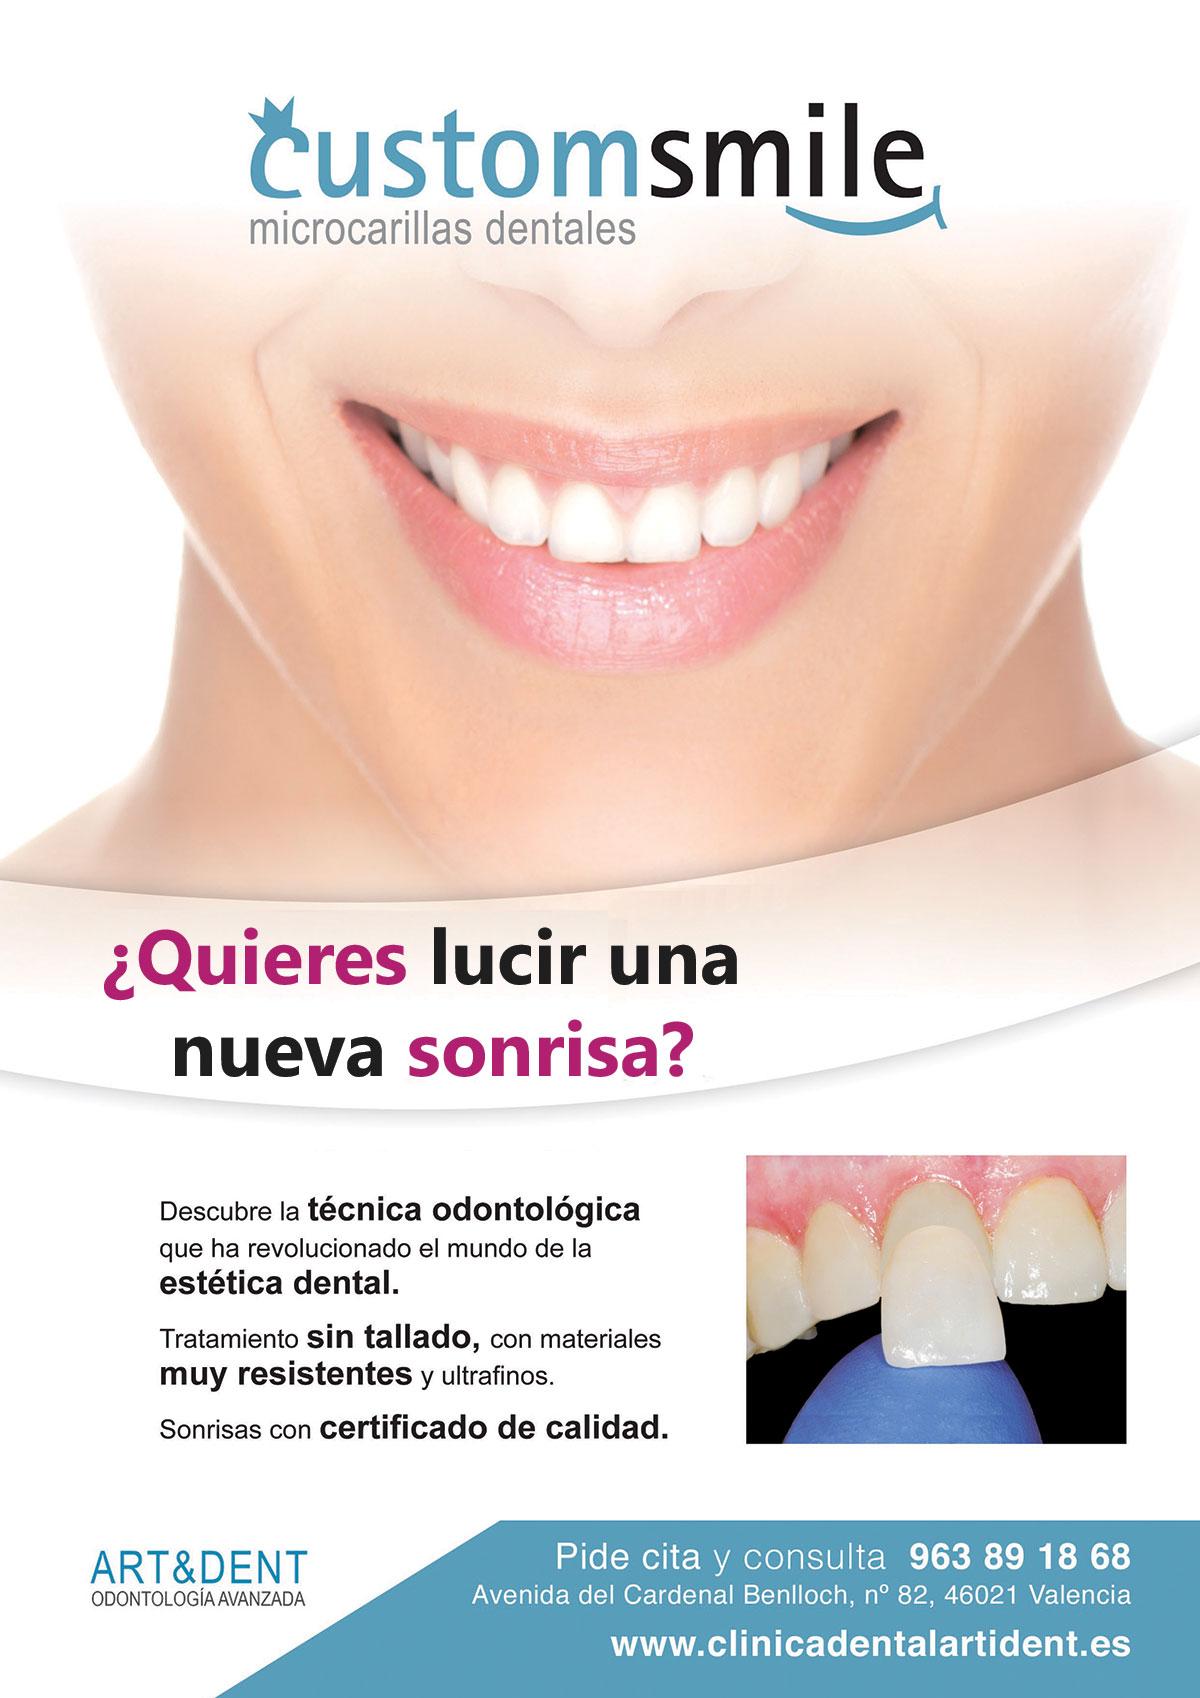 Microcarillas dentales Custom Smile